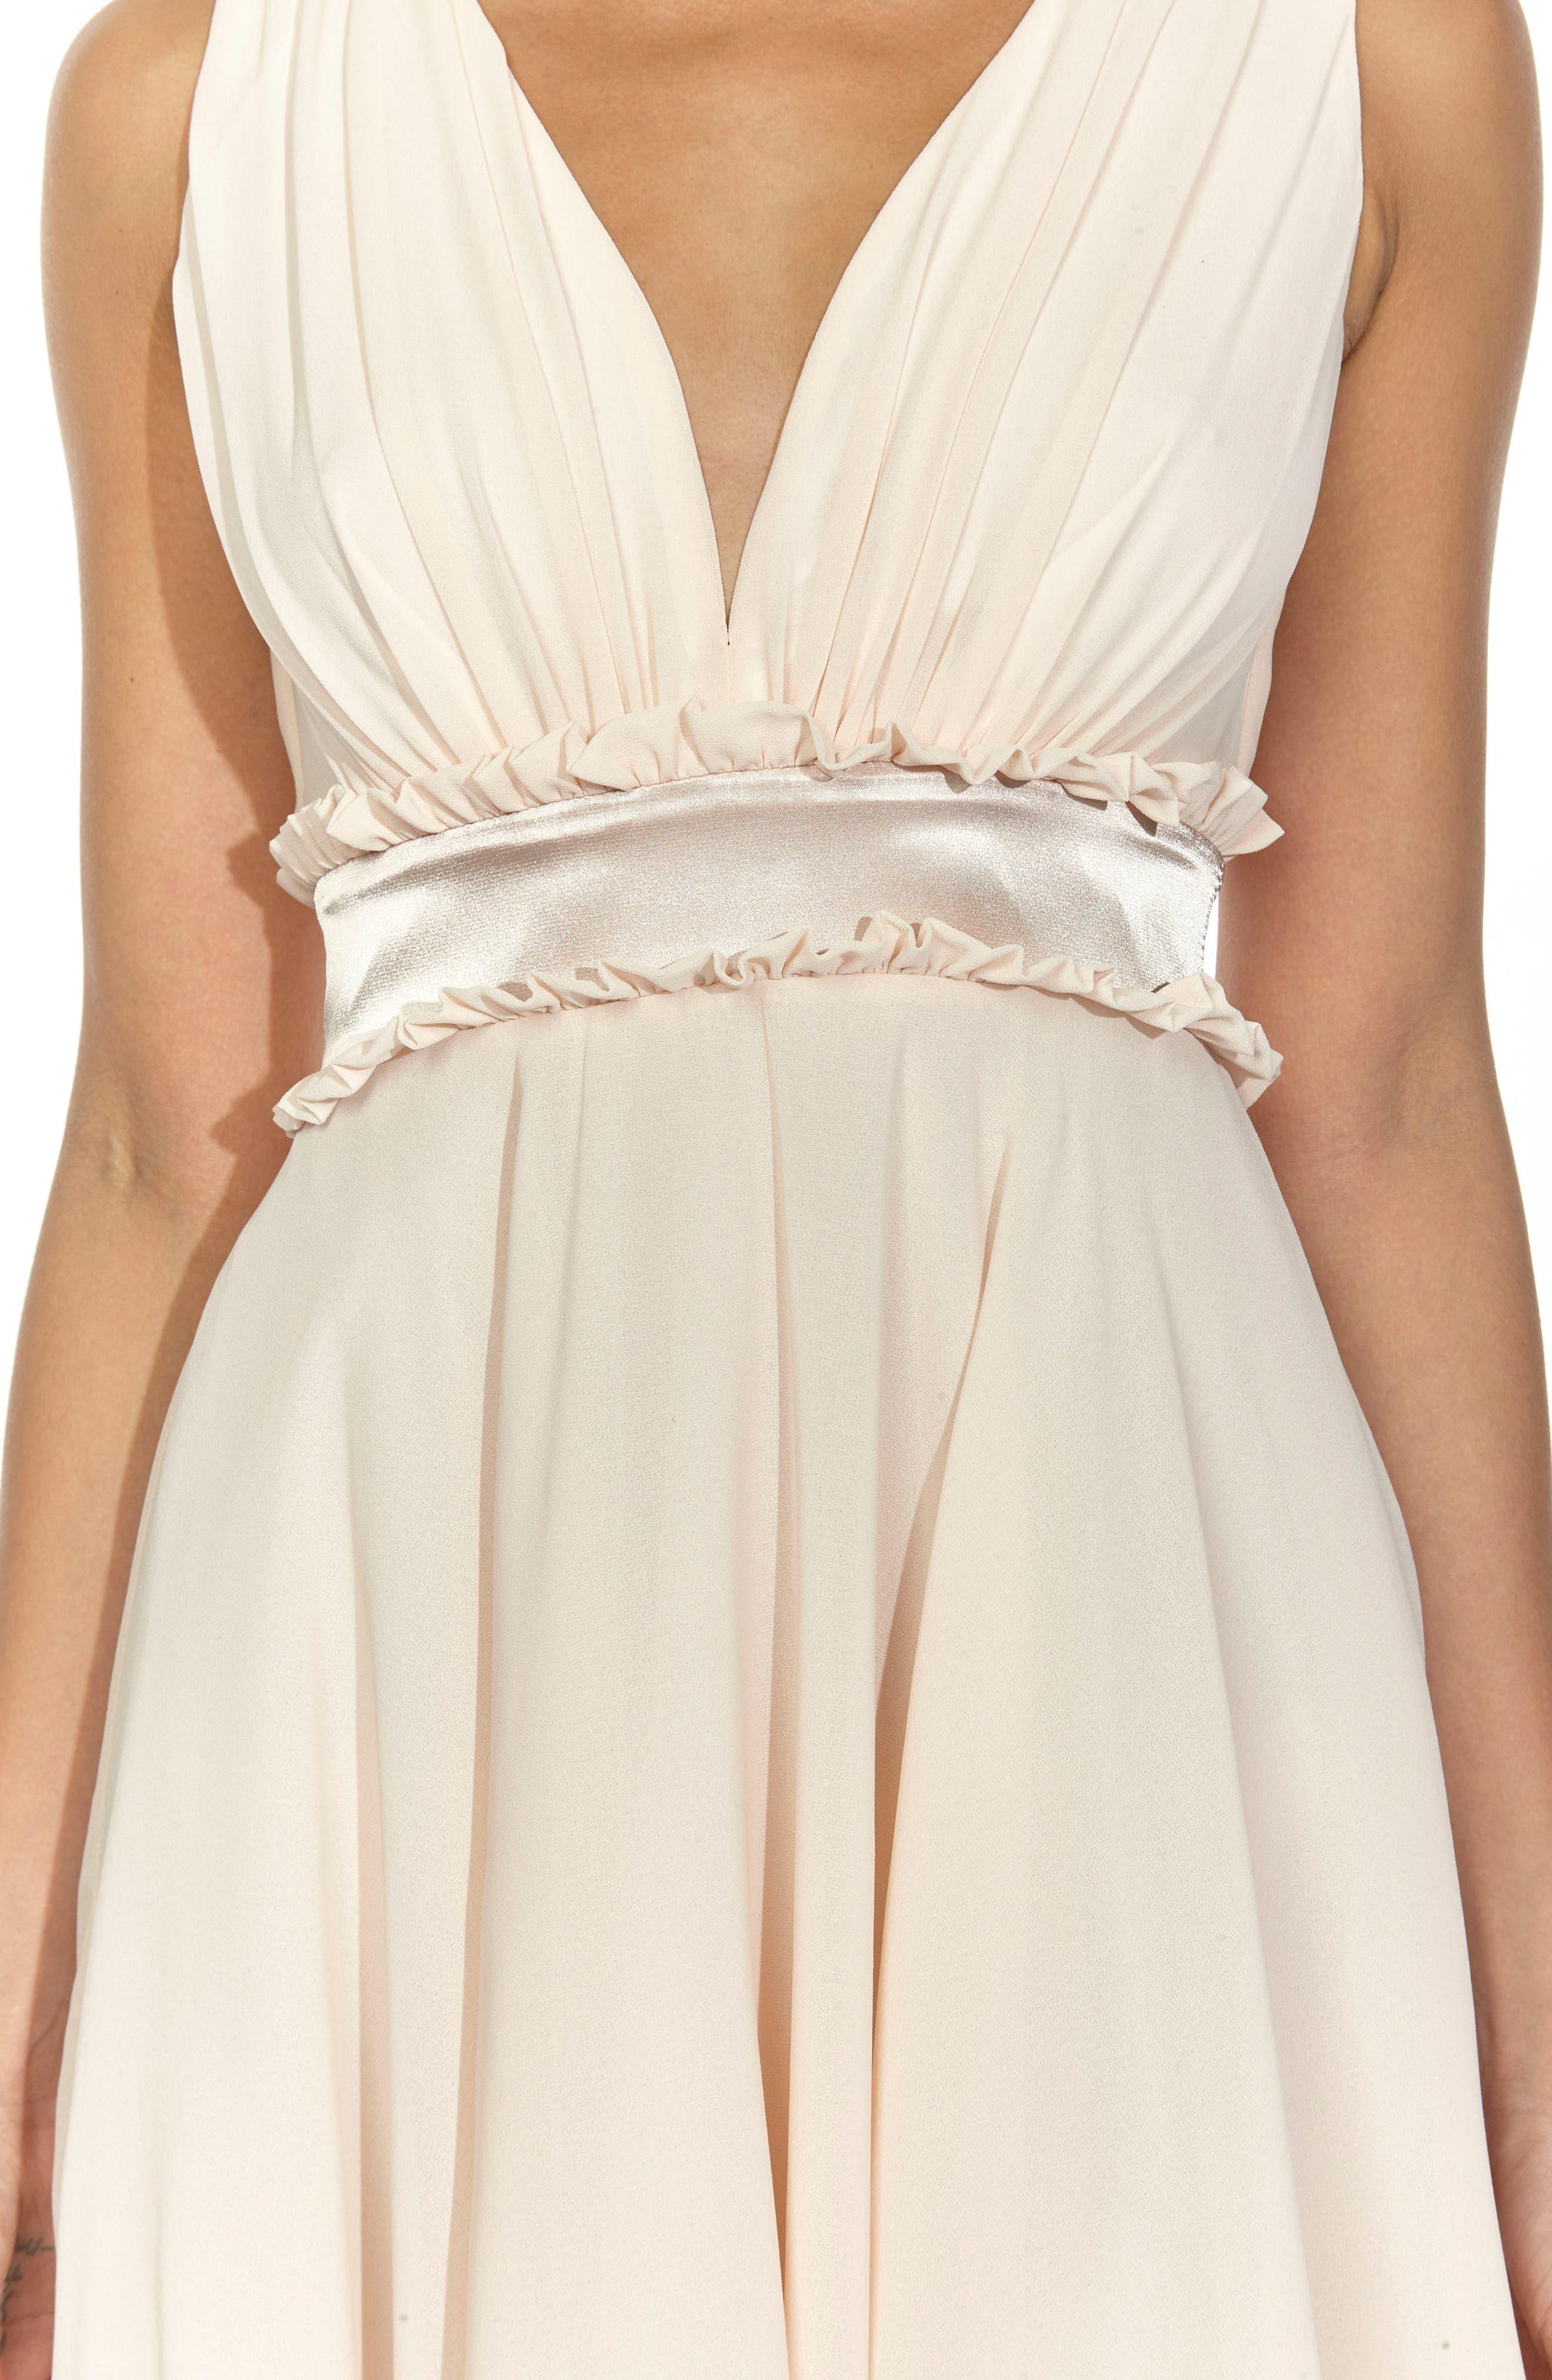 Joany Ruffle Waist Fit & Flare Dress,                             Alternate thumbnail 4, color,                             Nude